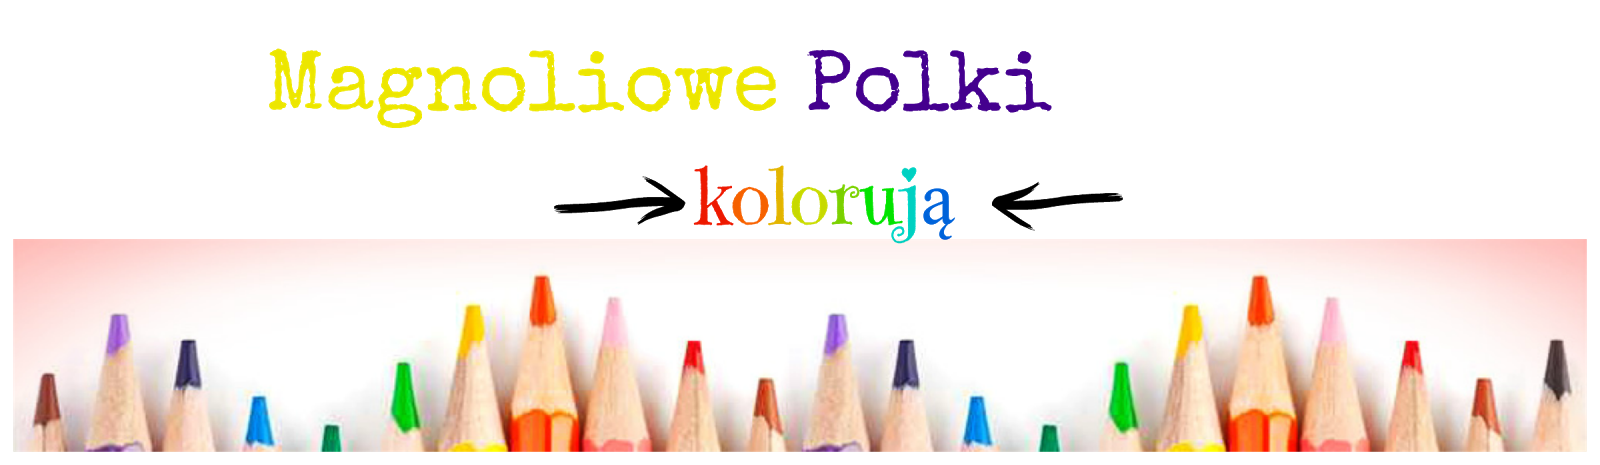 Magnoliowe Polki